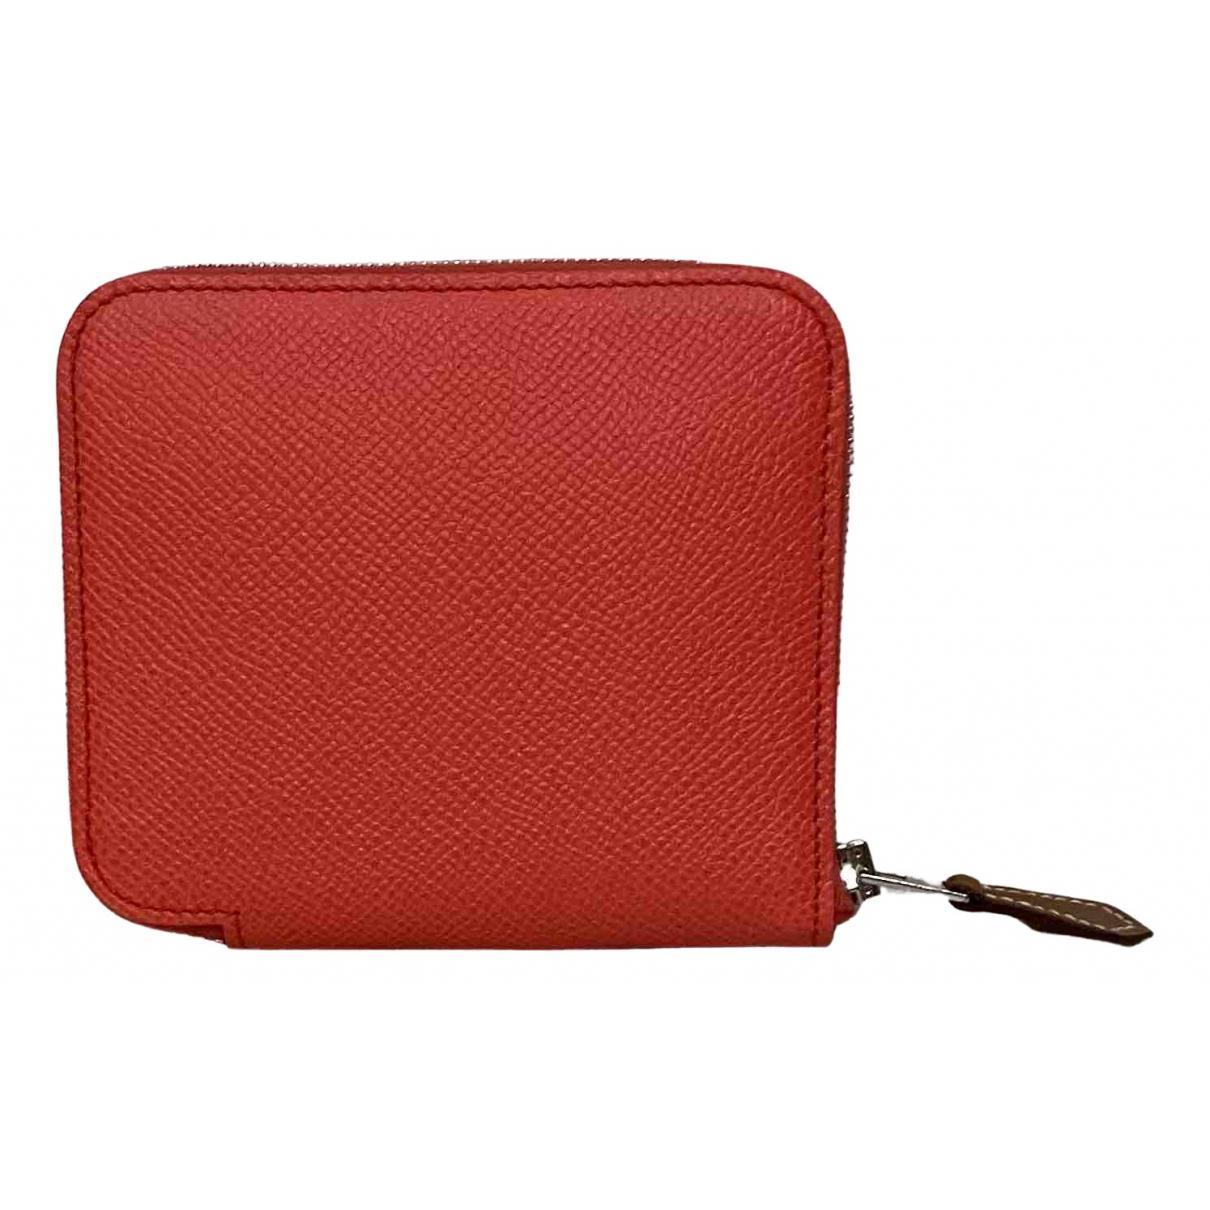 Hermes - Portefeuille Silkin pour femme en cuir - rose